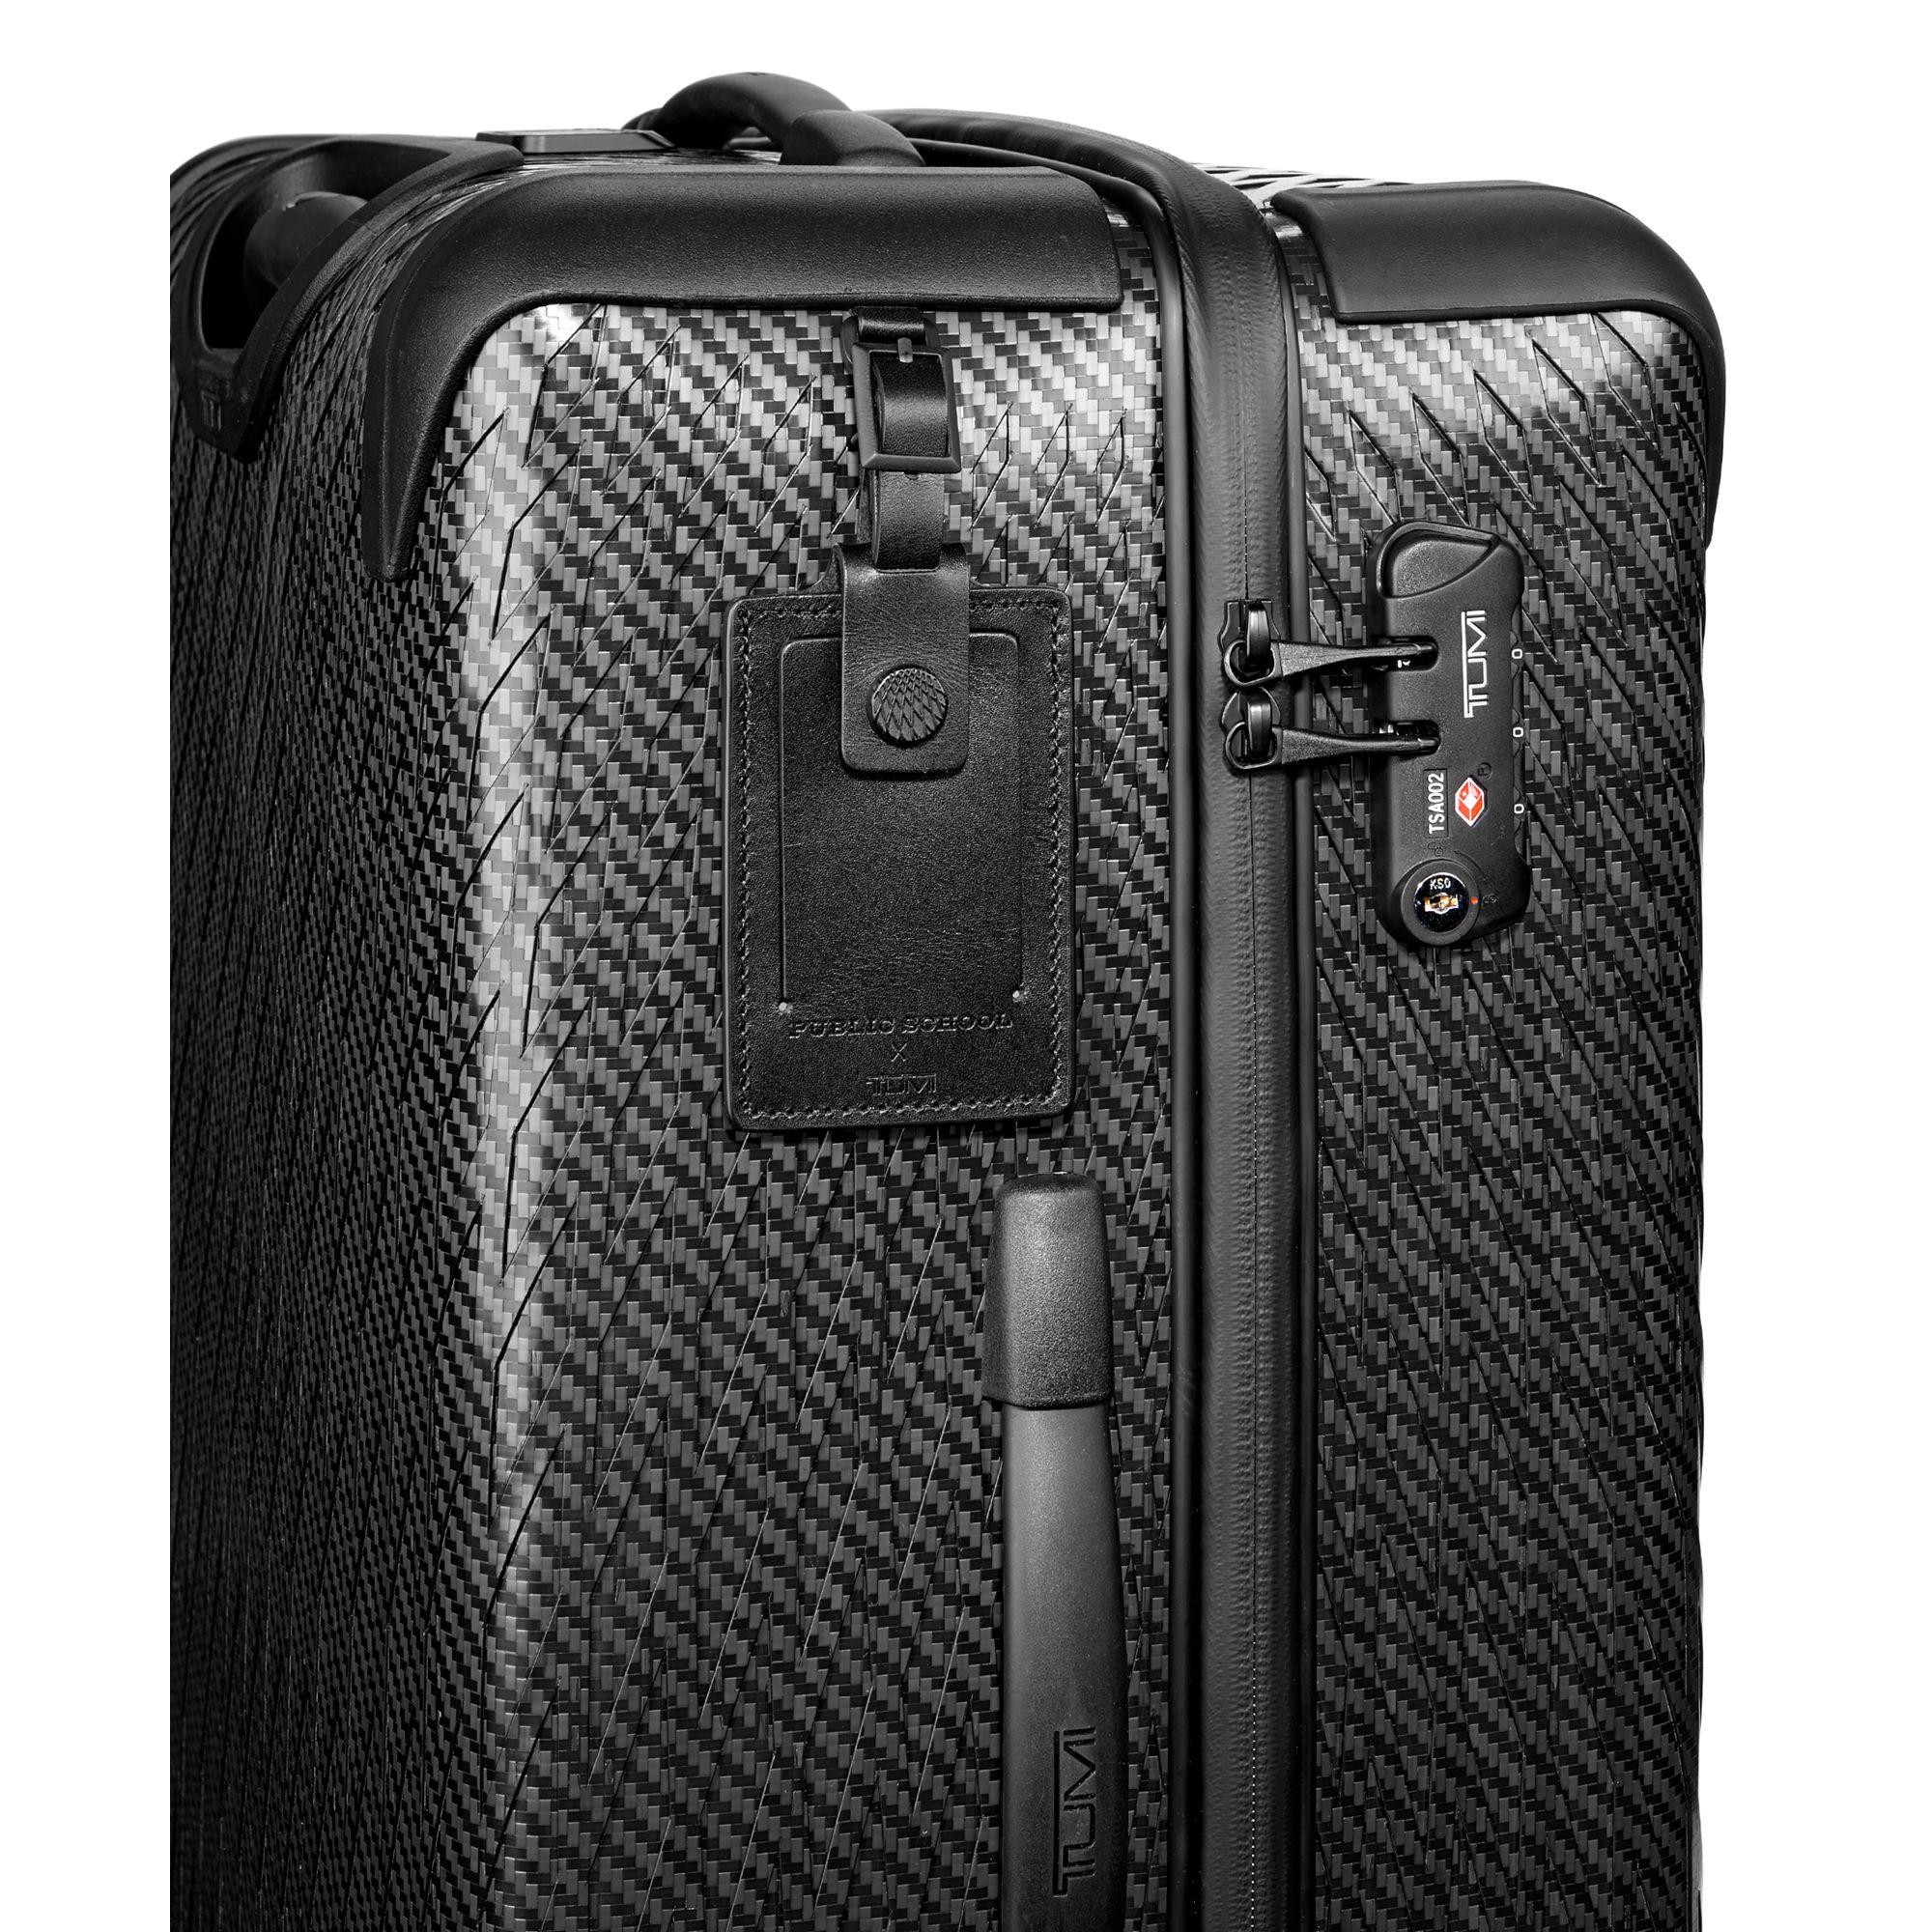 Tumi-Public-School-suitcase-5.jpeg